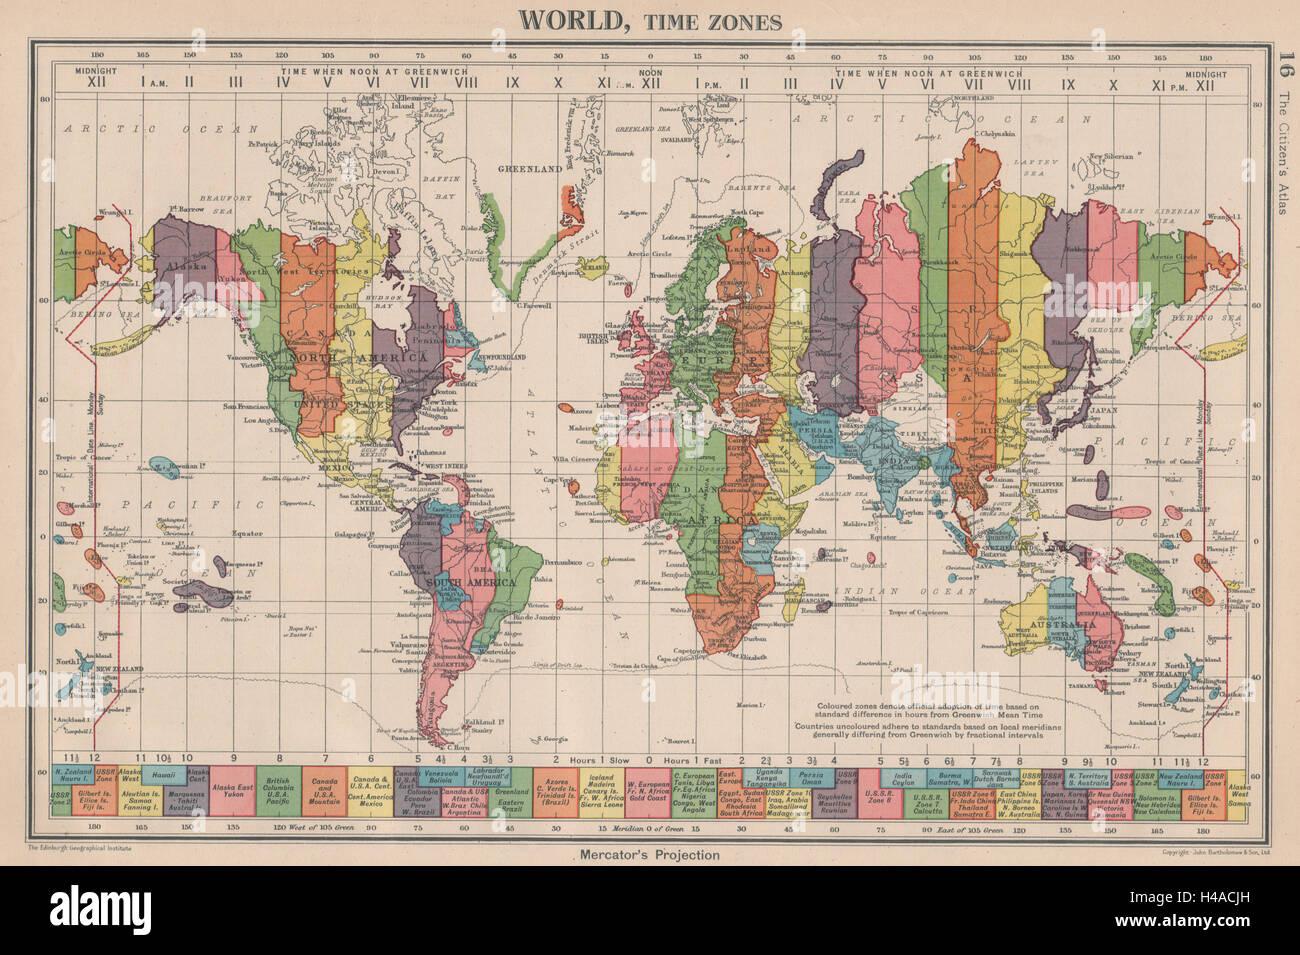 Map Of Ireland Time Zones.World Time Zones Uk Ireland Spain France On Same Zone Stock